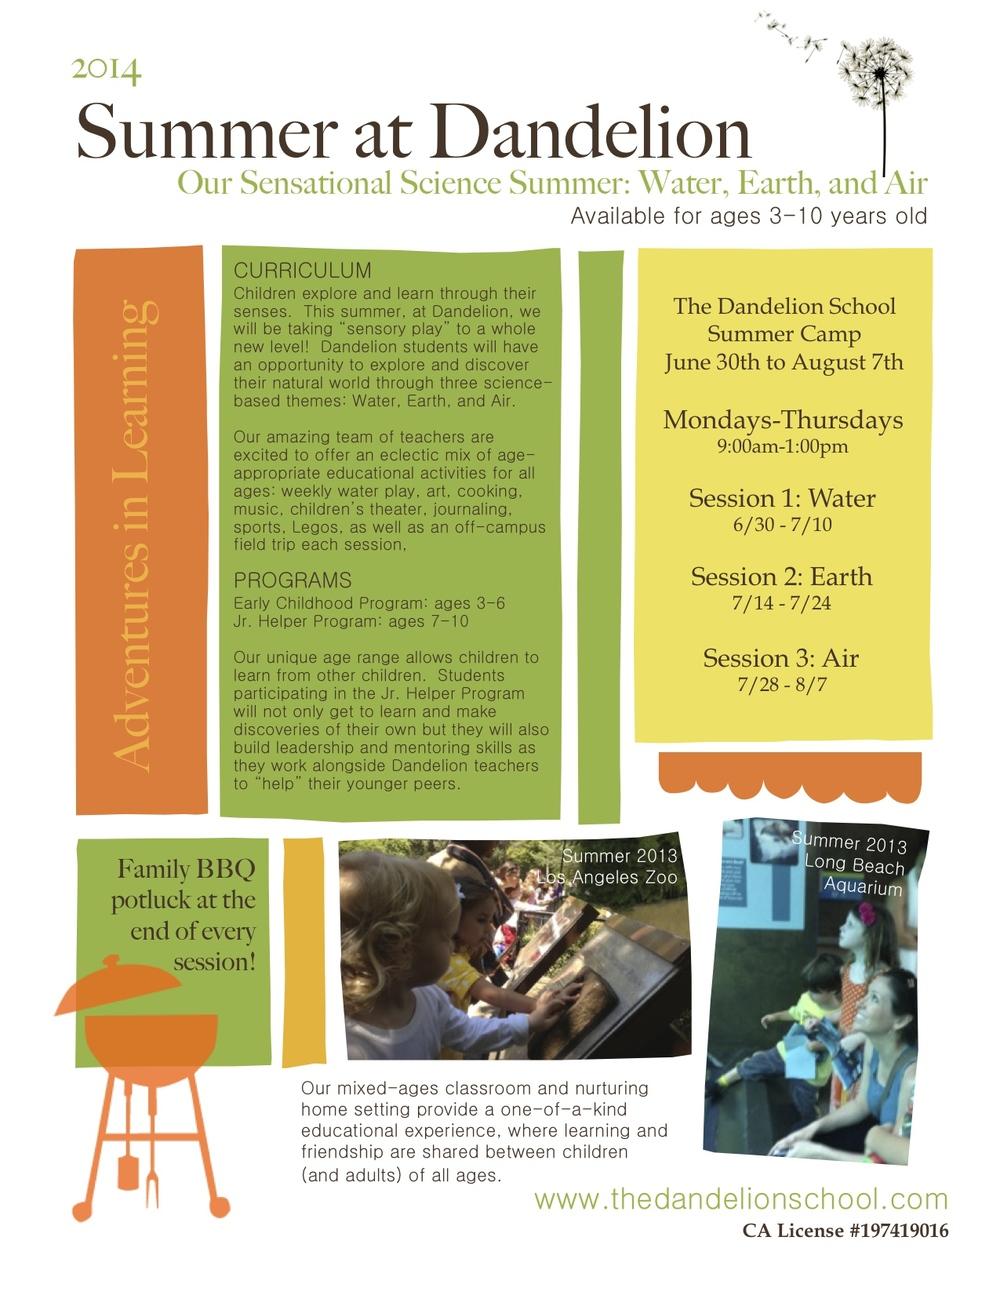 Spring Break Summer Camps Dandelion